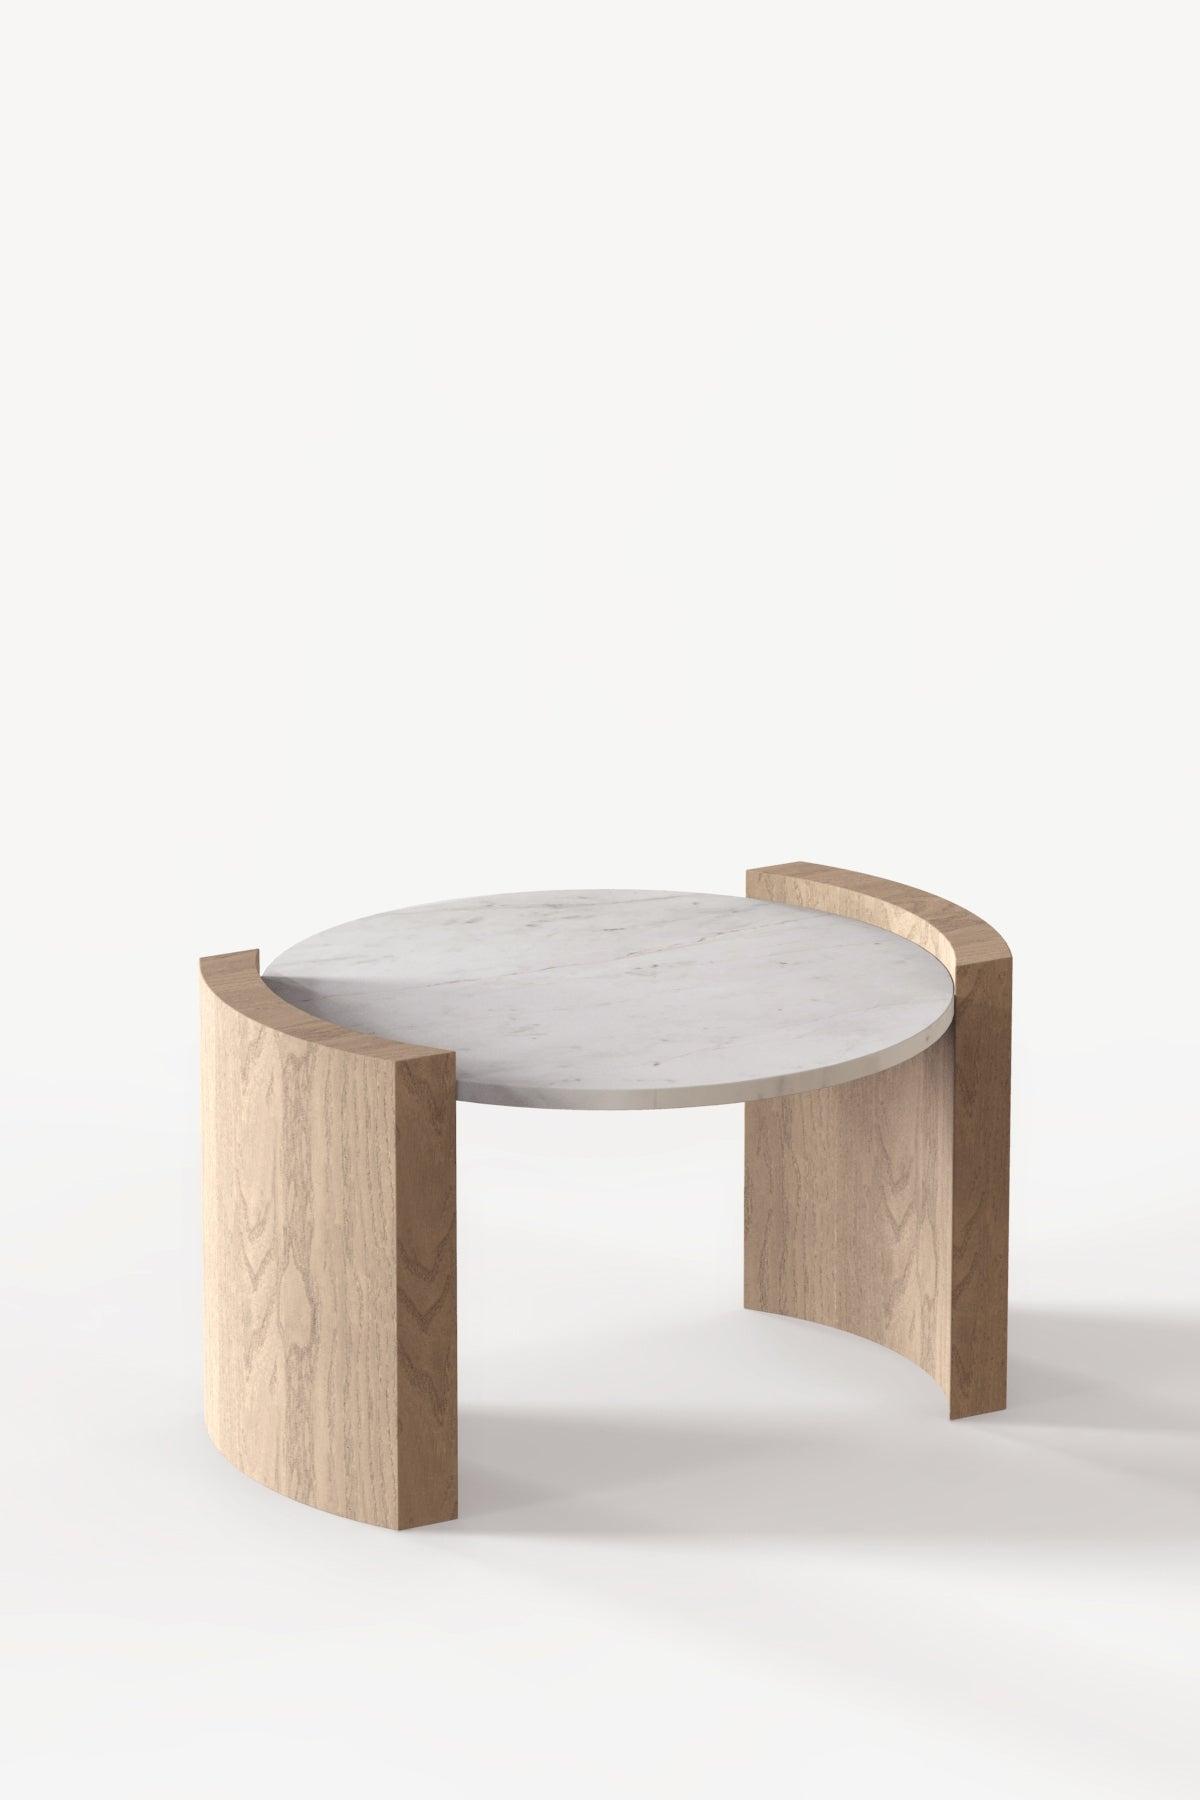 JIA-low-table.rendering-1 (1)